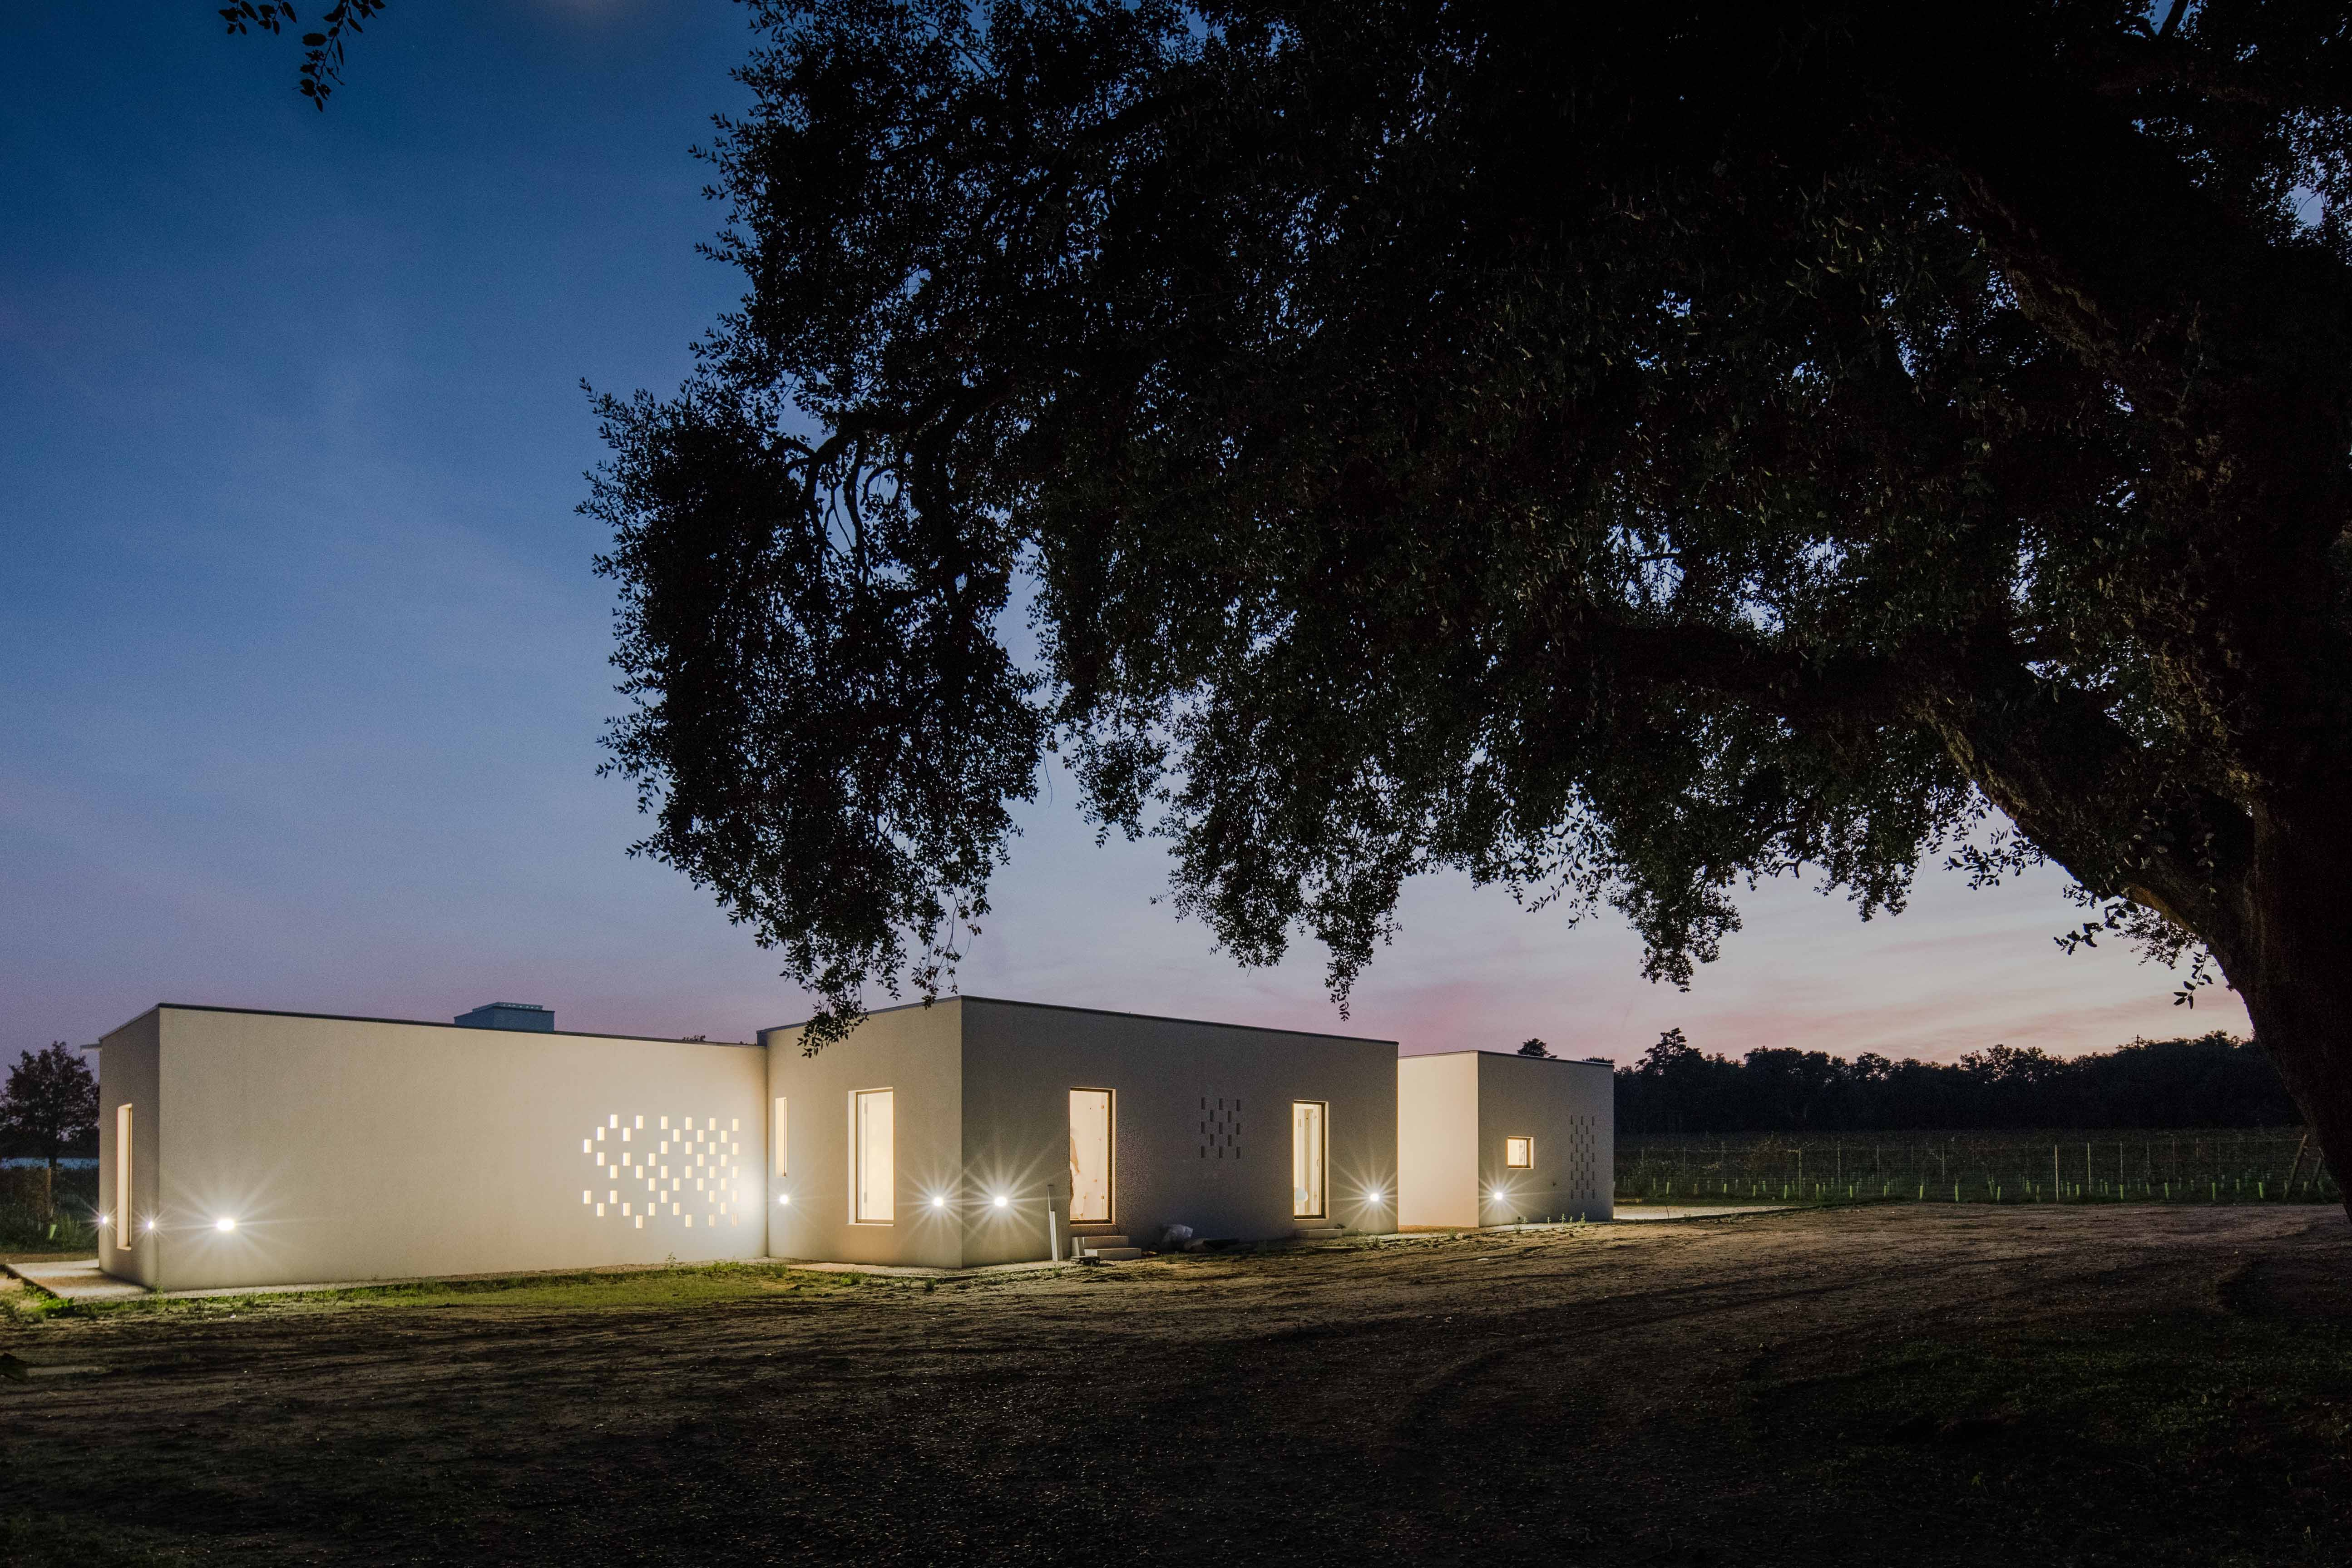 Vineyard house illuminated at night